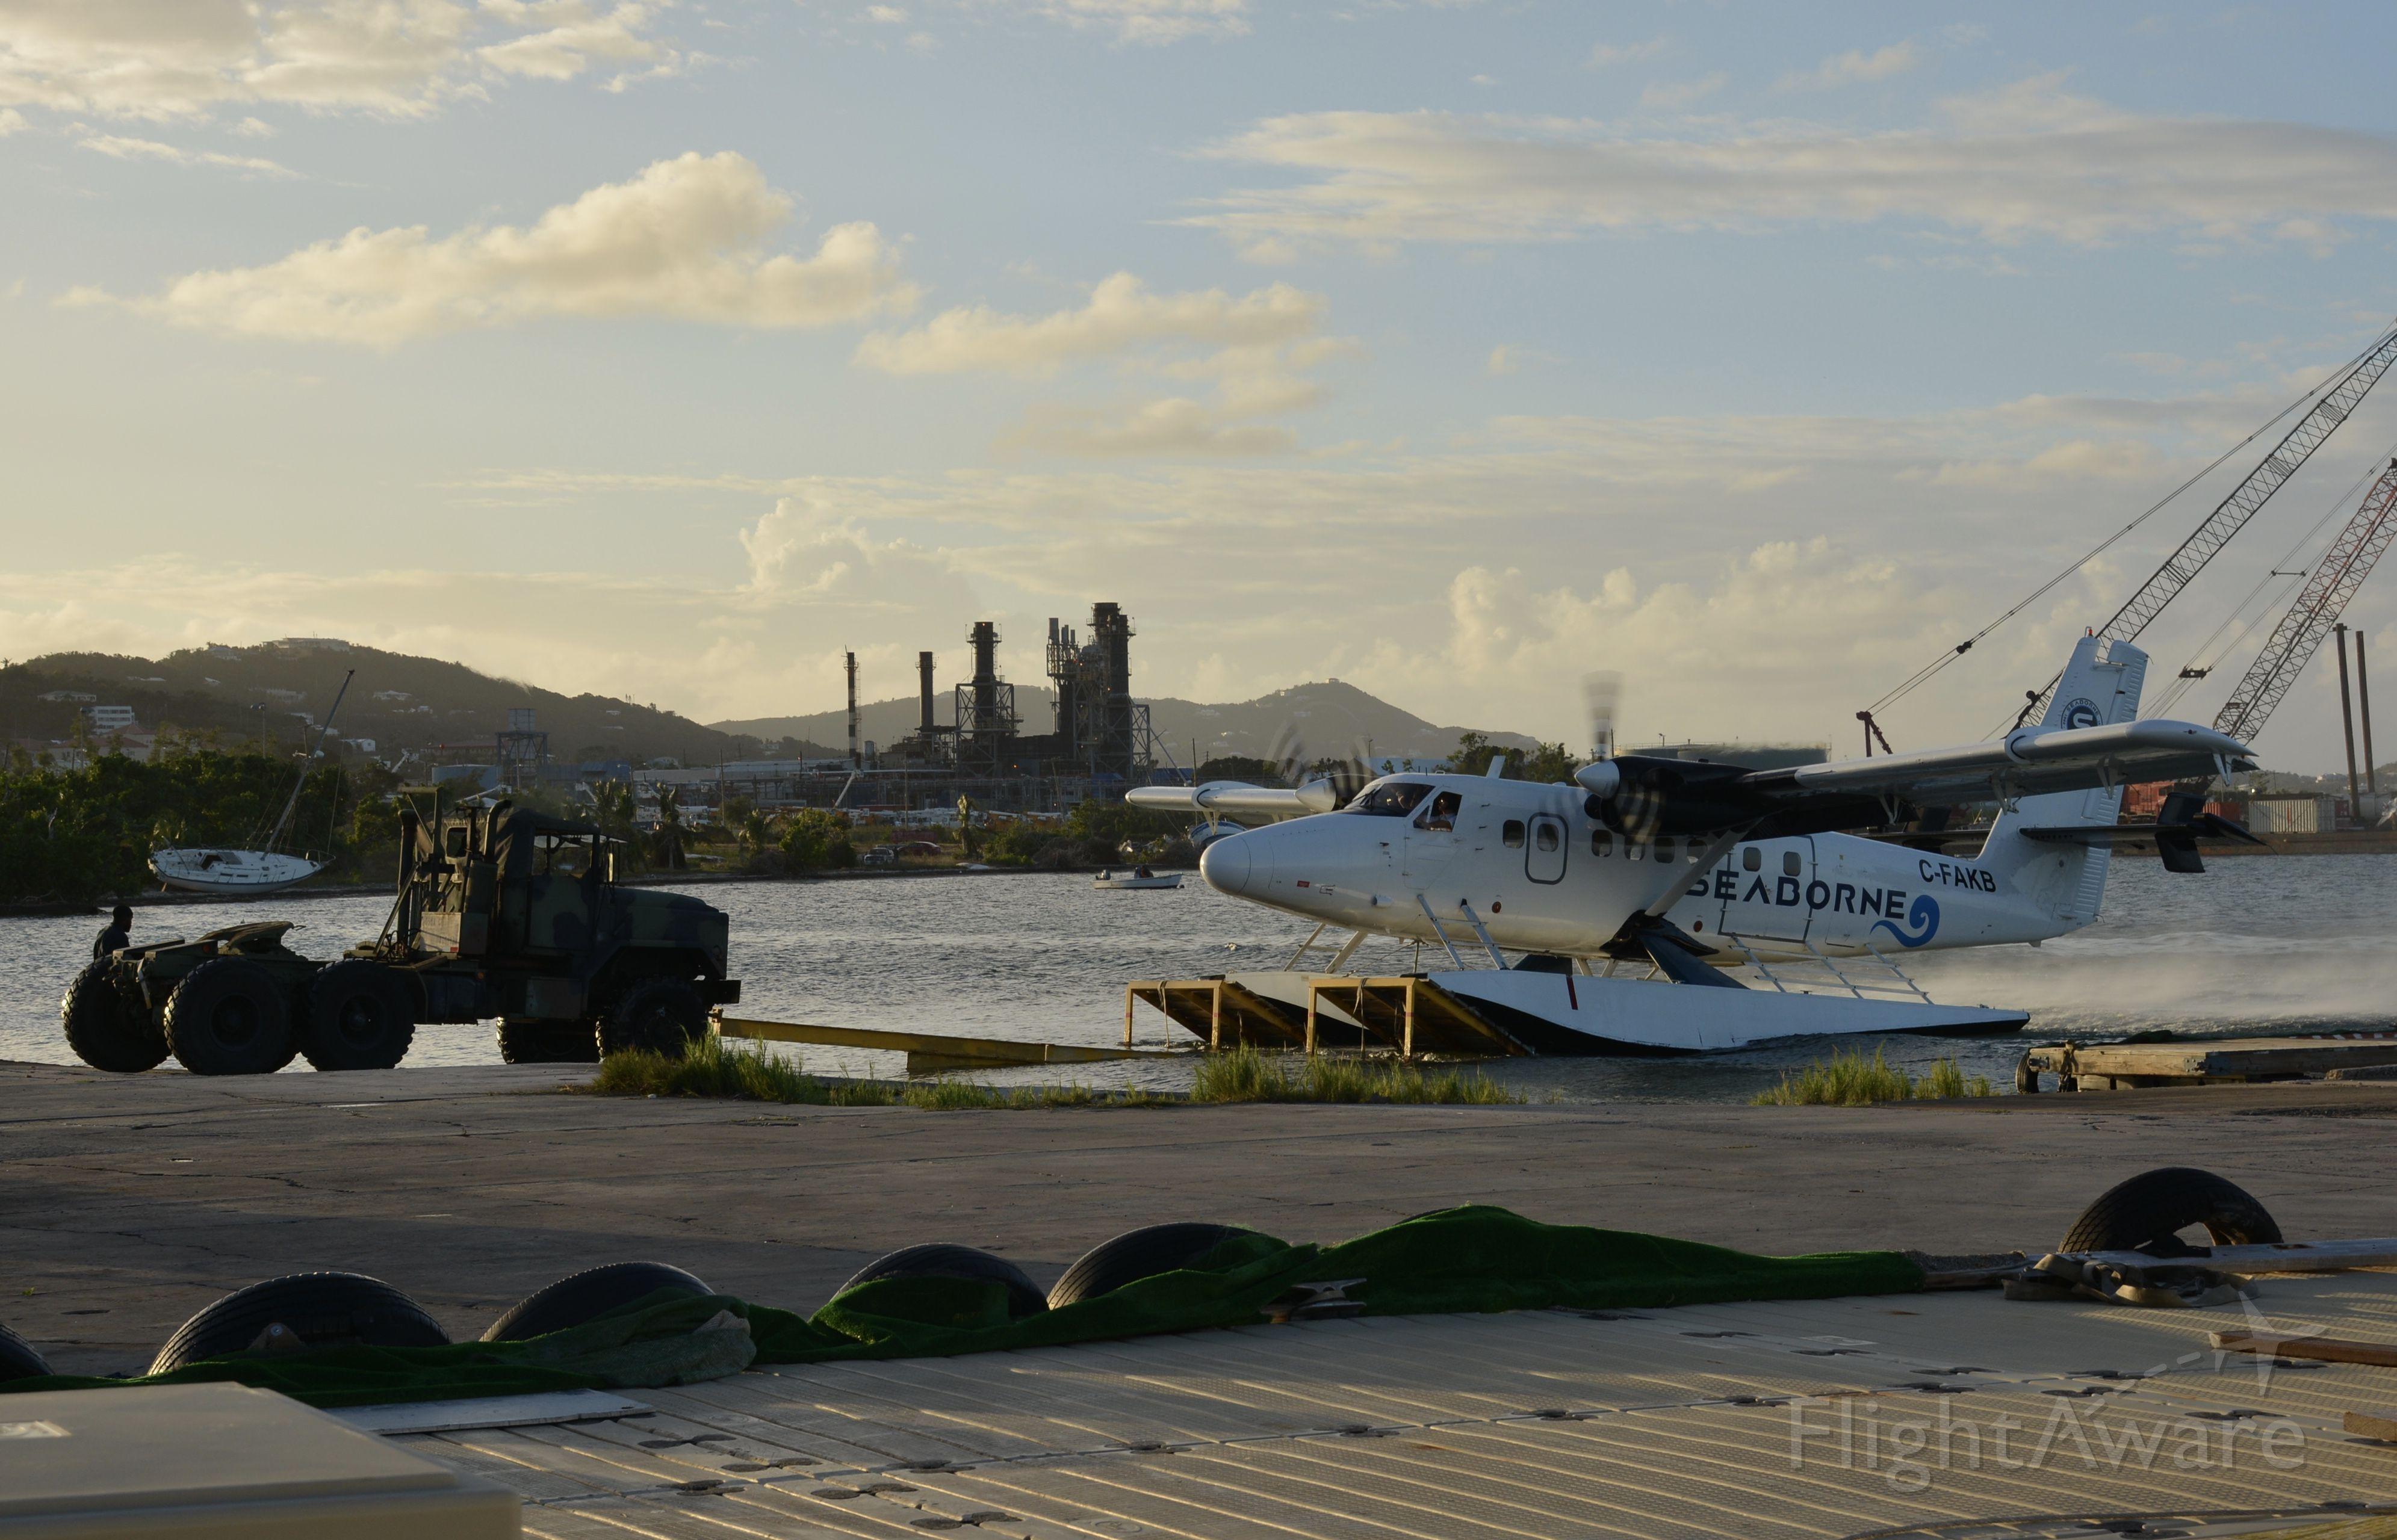 De Havilland Canada Twin Otter (C-FAKB)